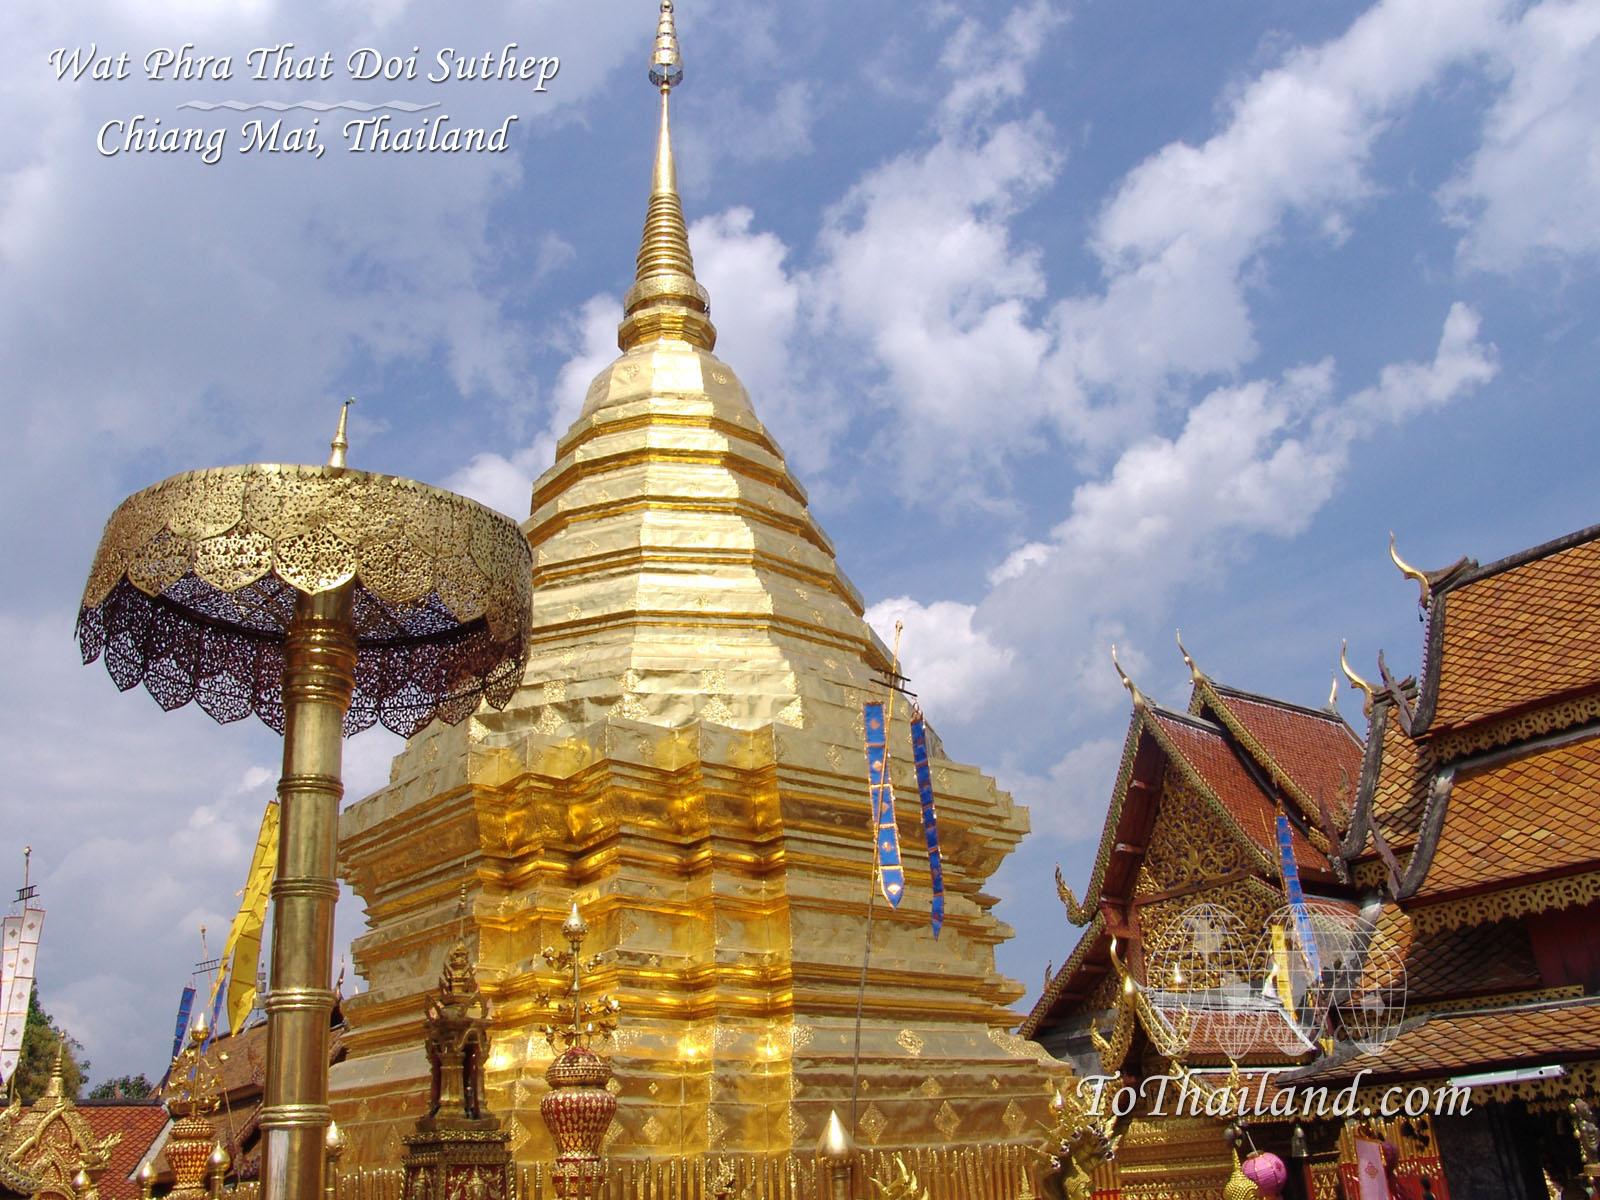 Chiangmai wallpaper Desinows Blog 1600x1200